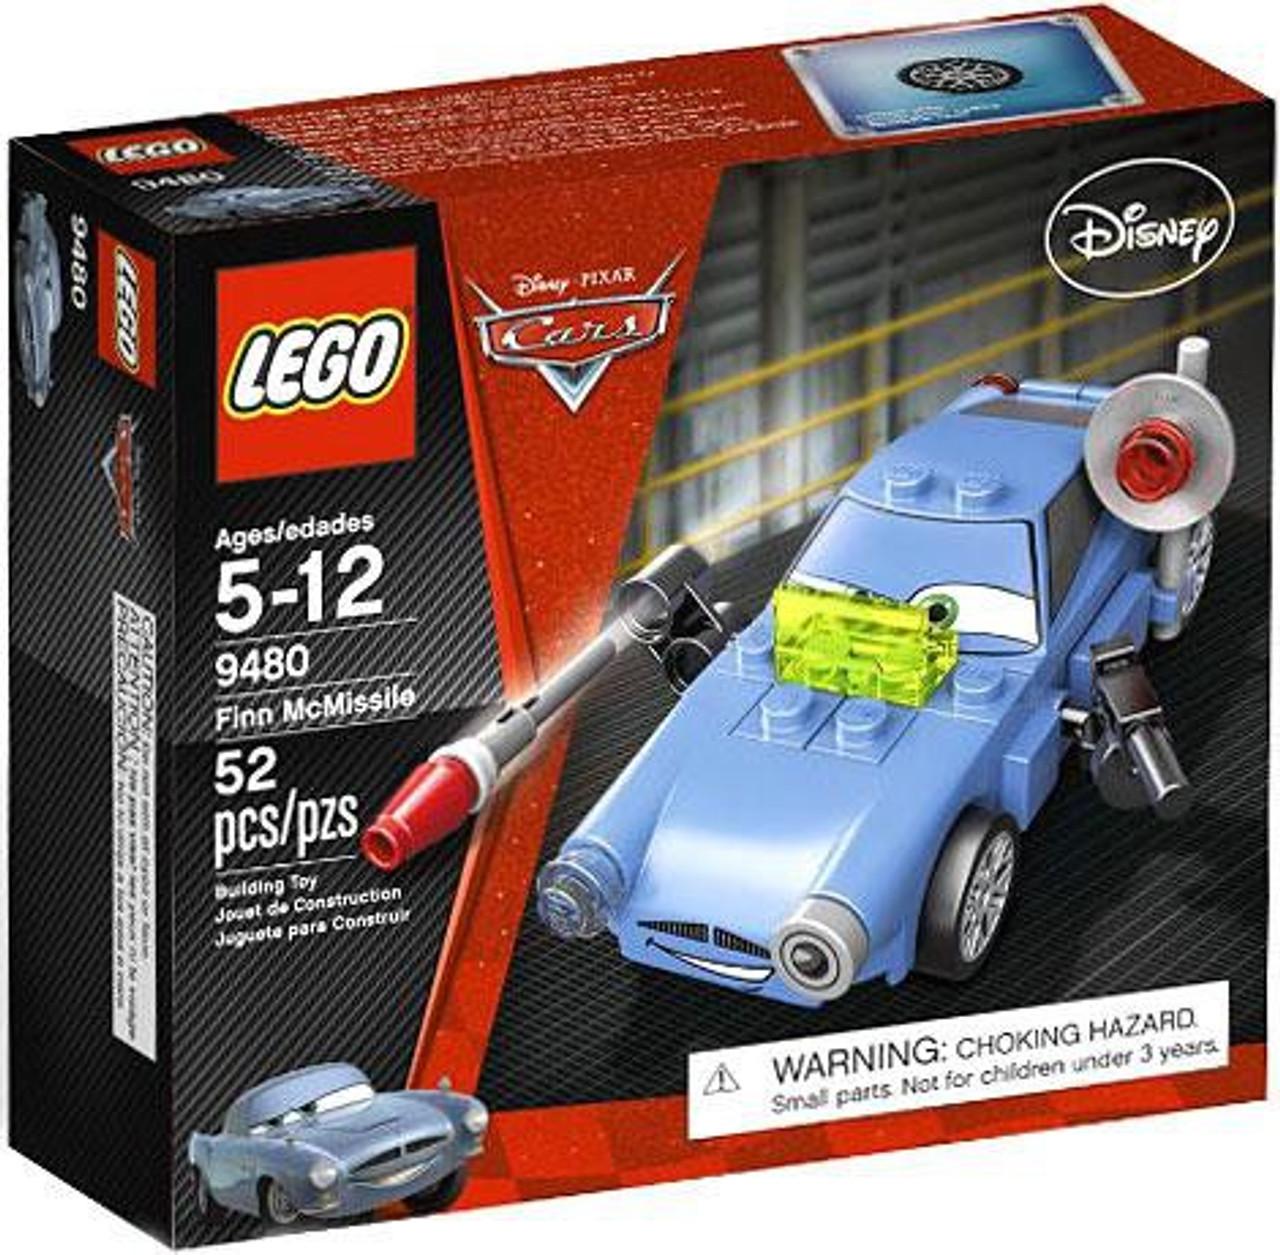 LEGO Disney Cars Finn McMissile Set #9480